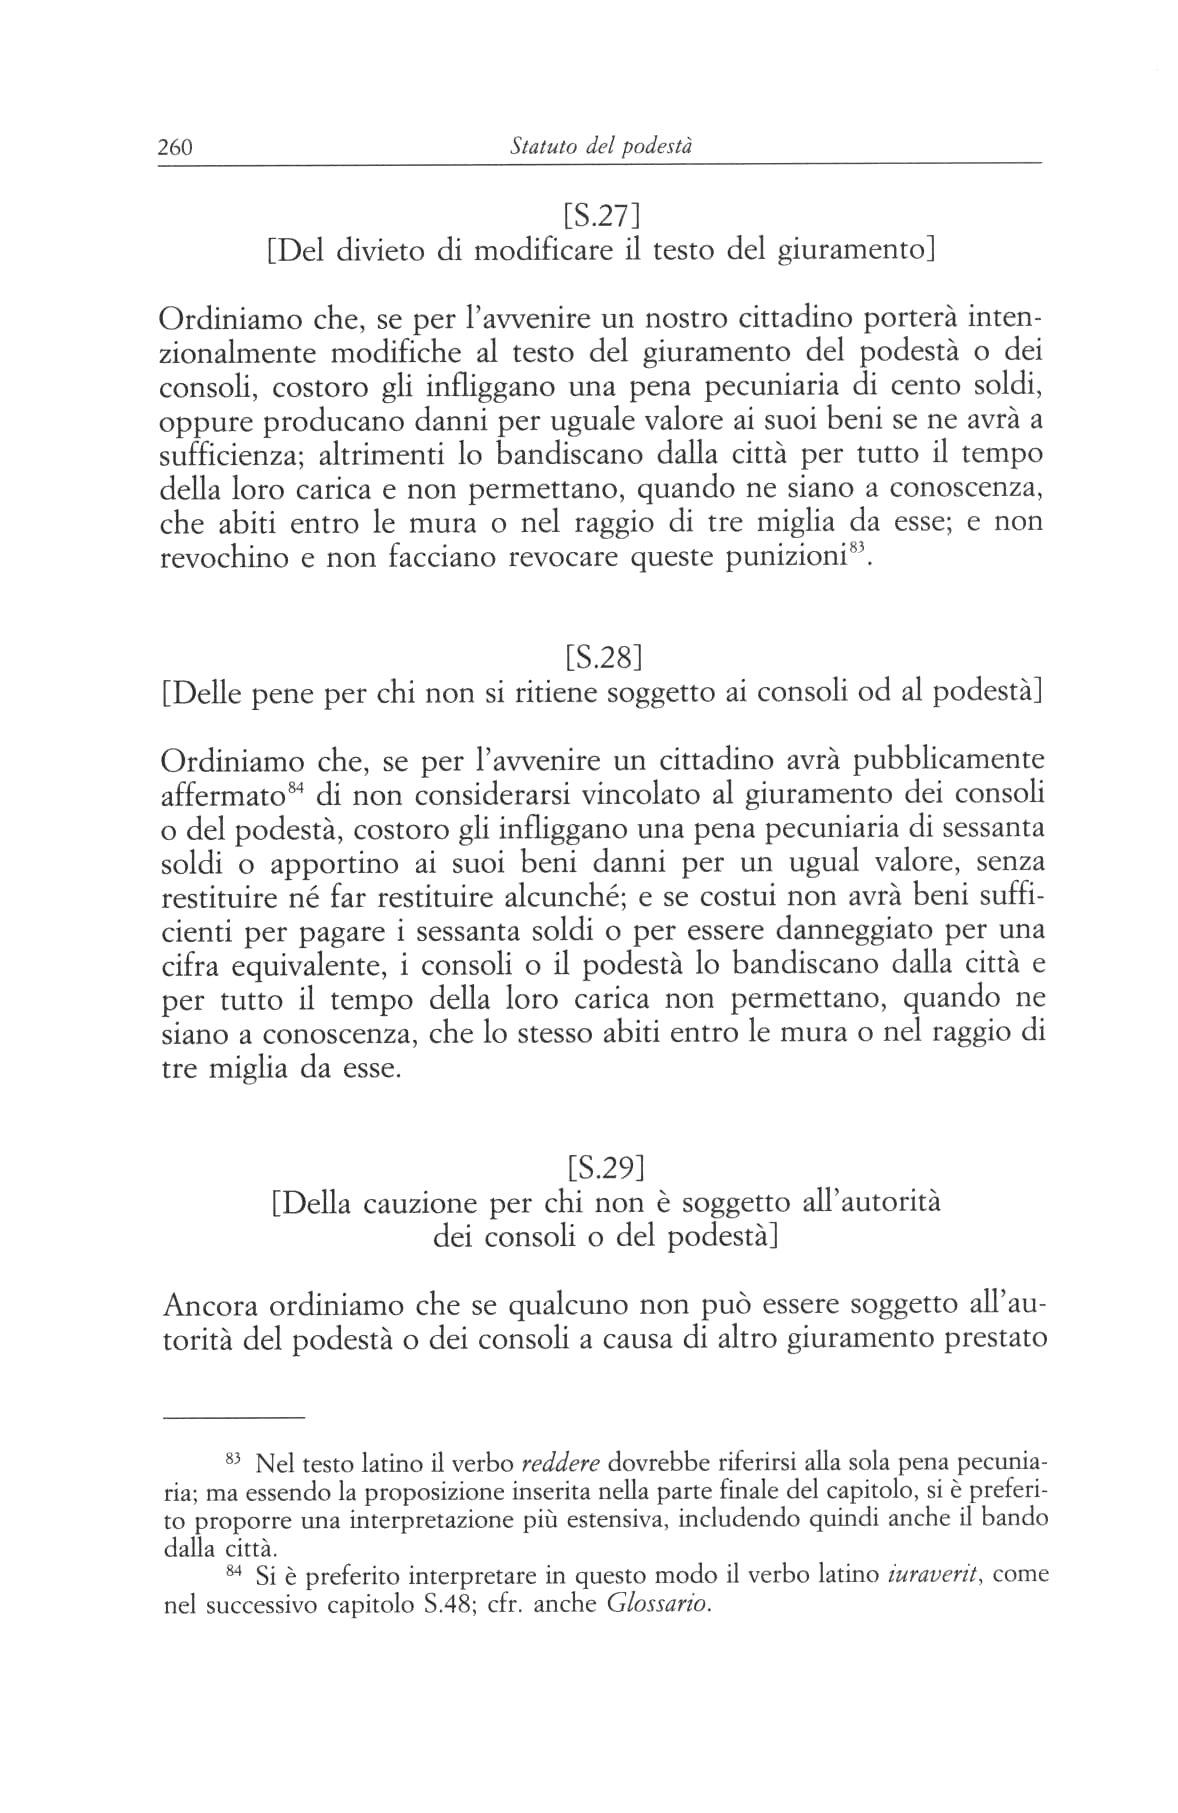 statuti pistoiesi del sec.XII 0260.jpg